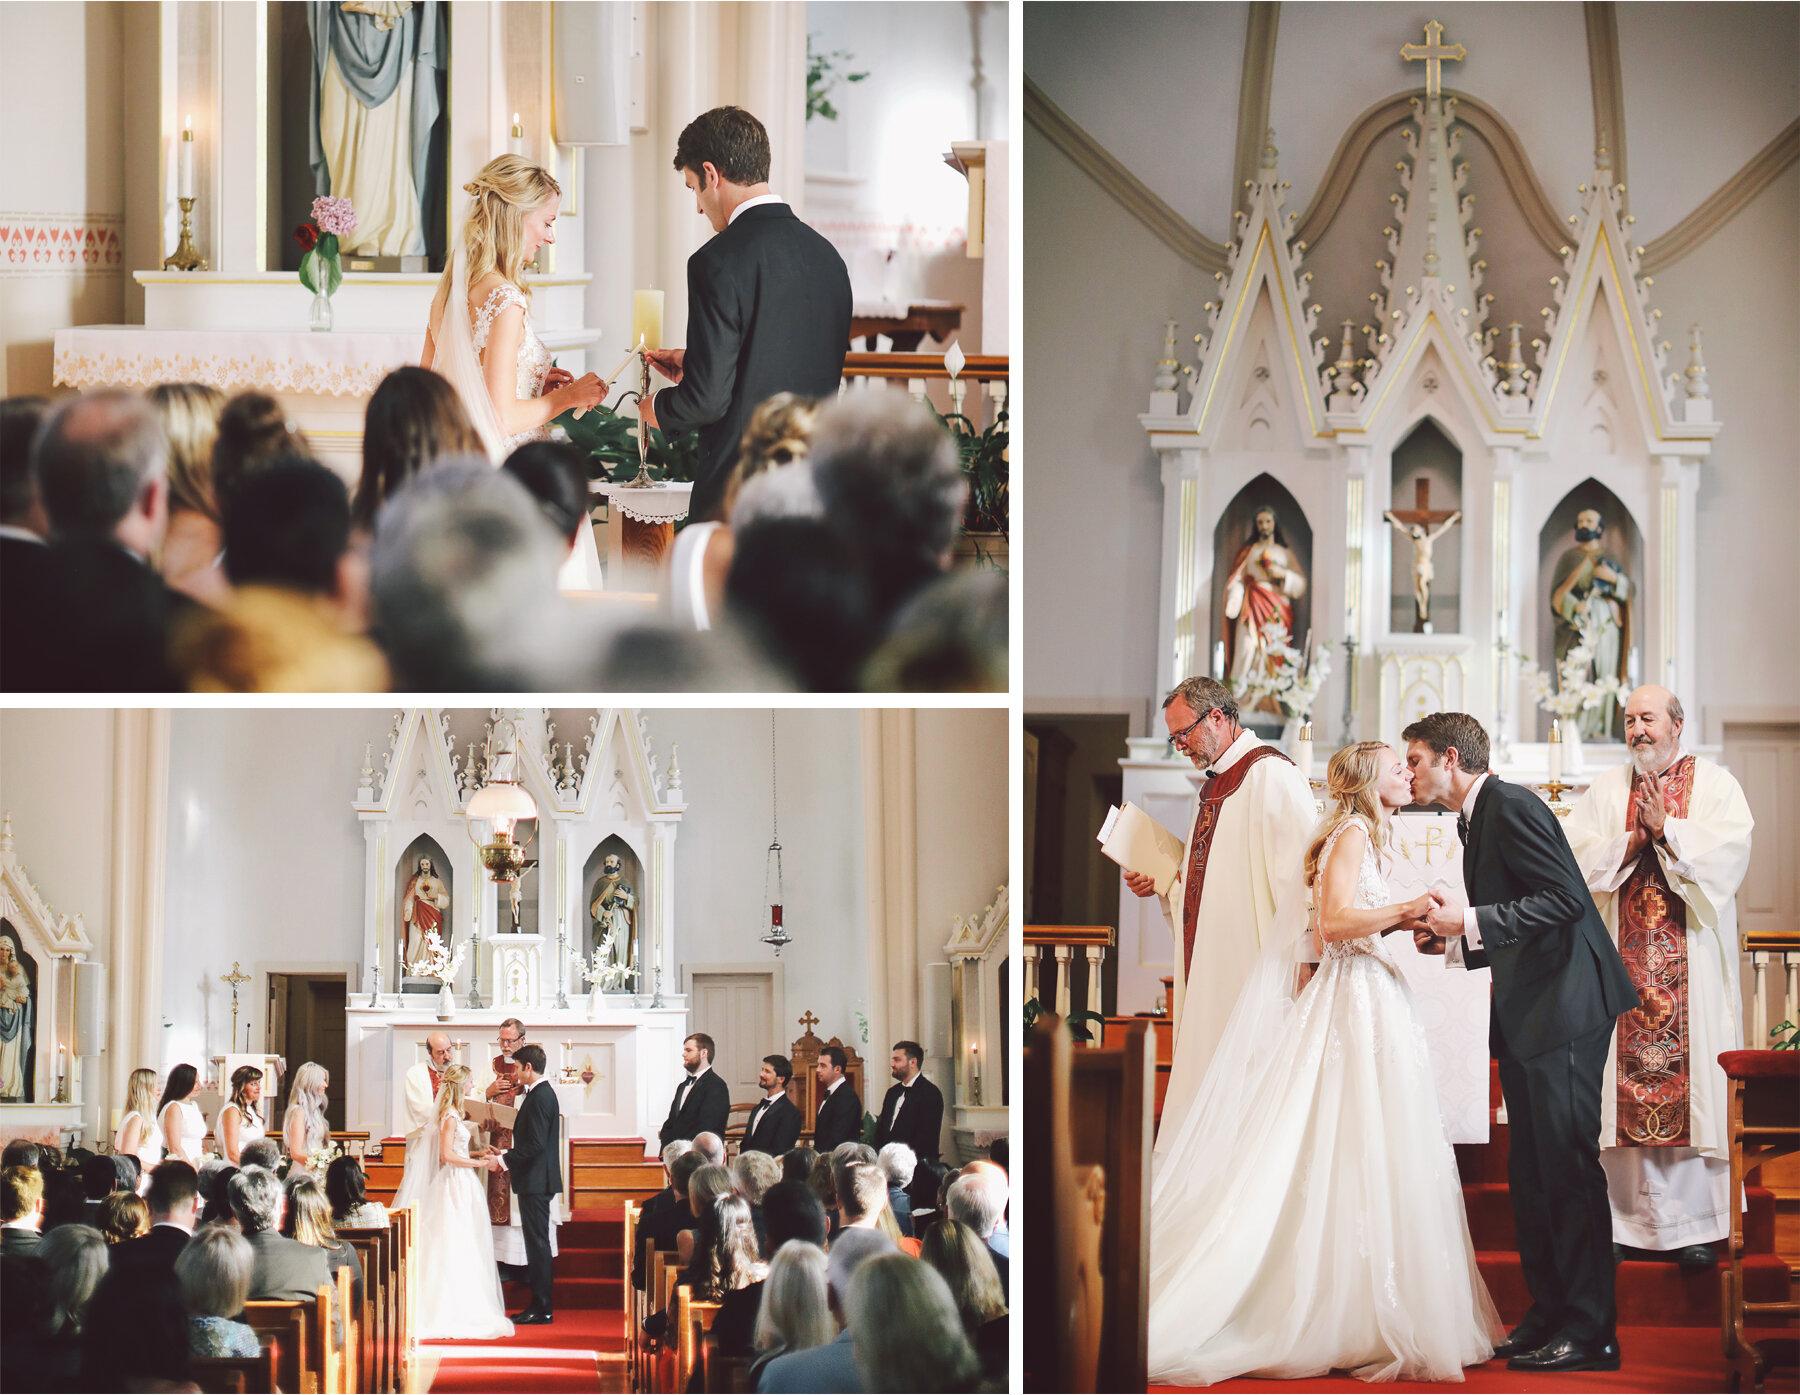 13 Wedding Vick Photography Minneapolis Minnesota Ceremony St Peters Mendota Prayer Kiss Michelle and William.jpg